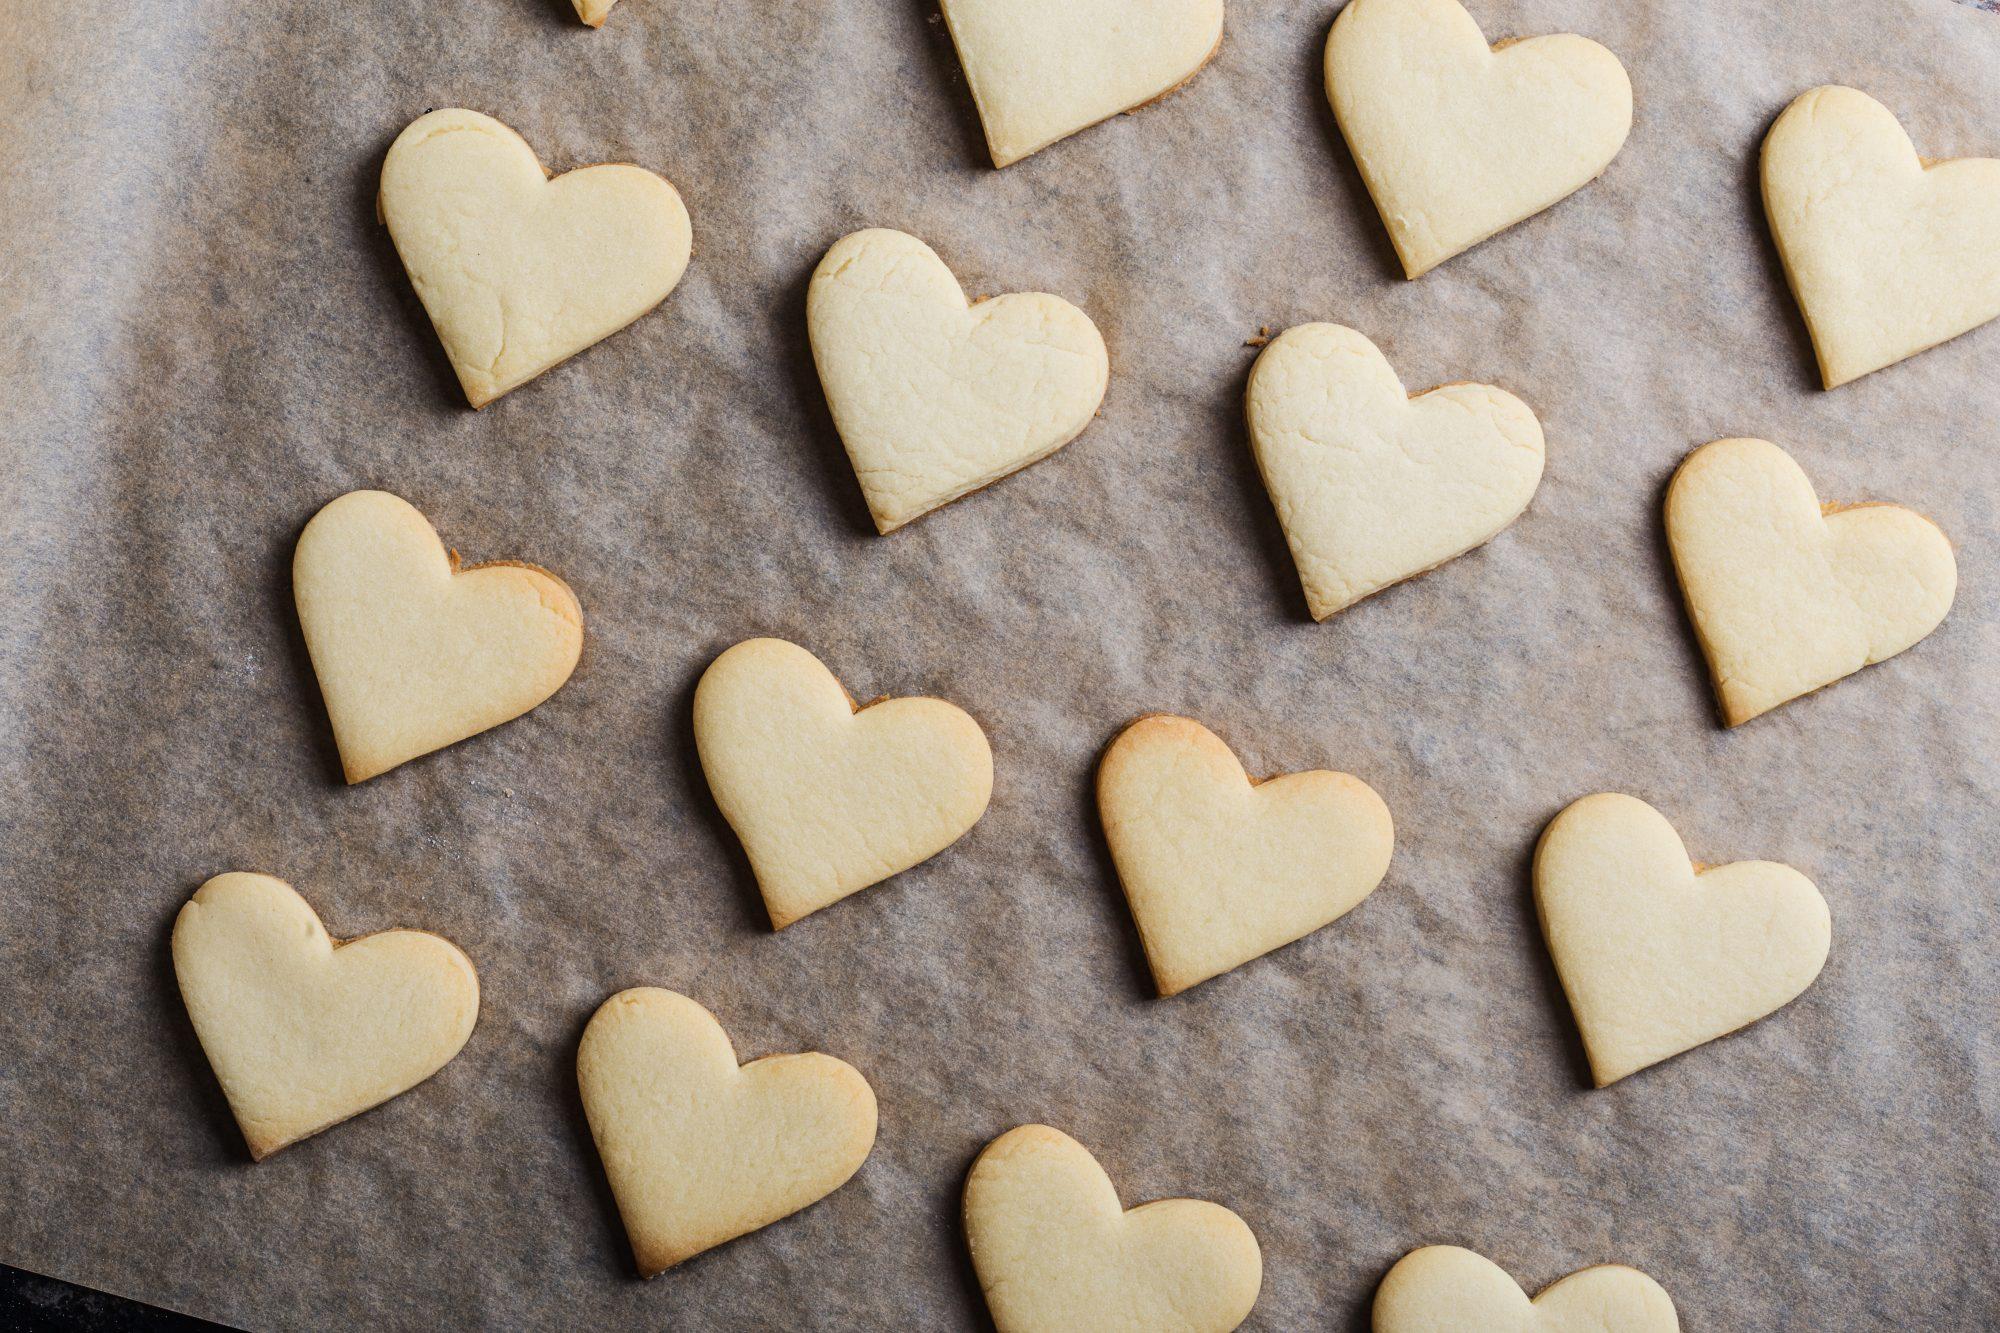 Heart cookies Getty 9/30/20